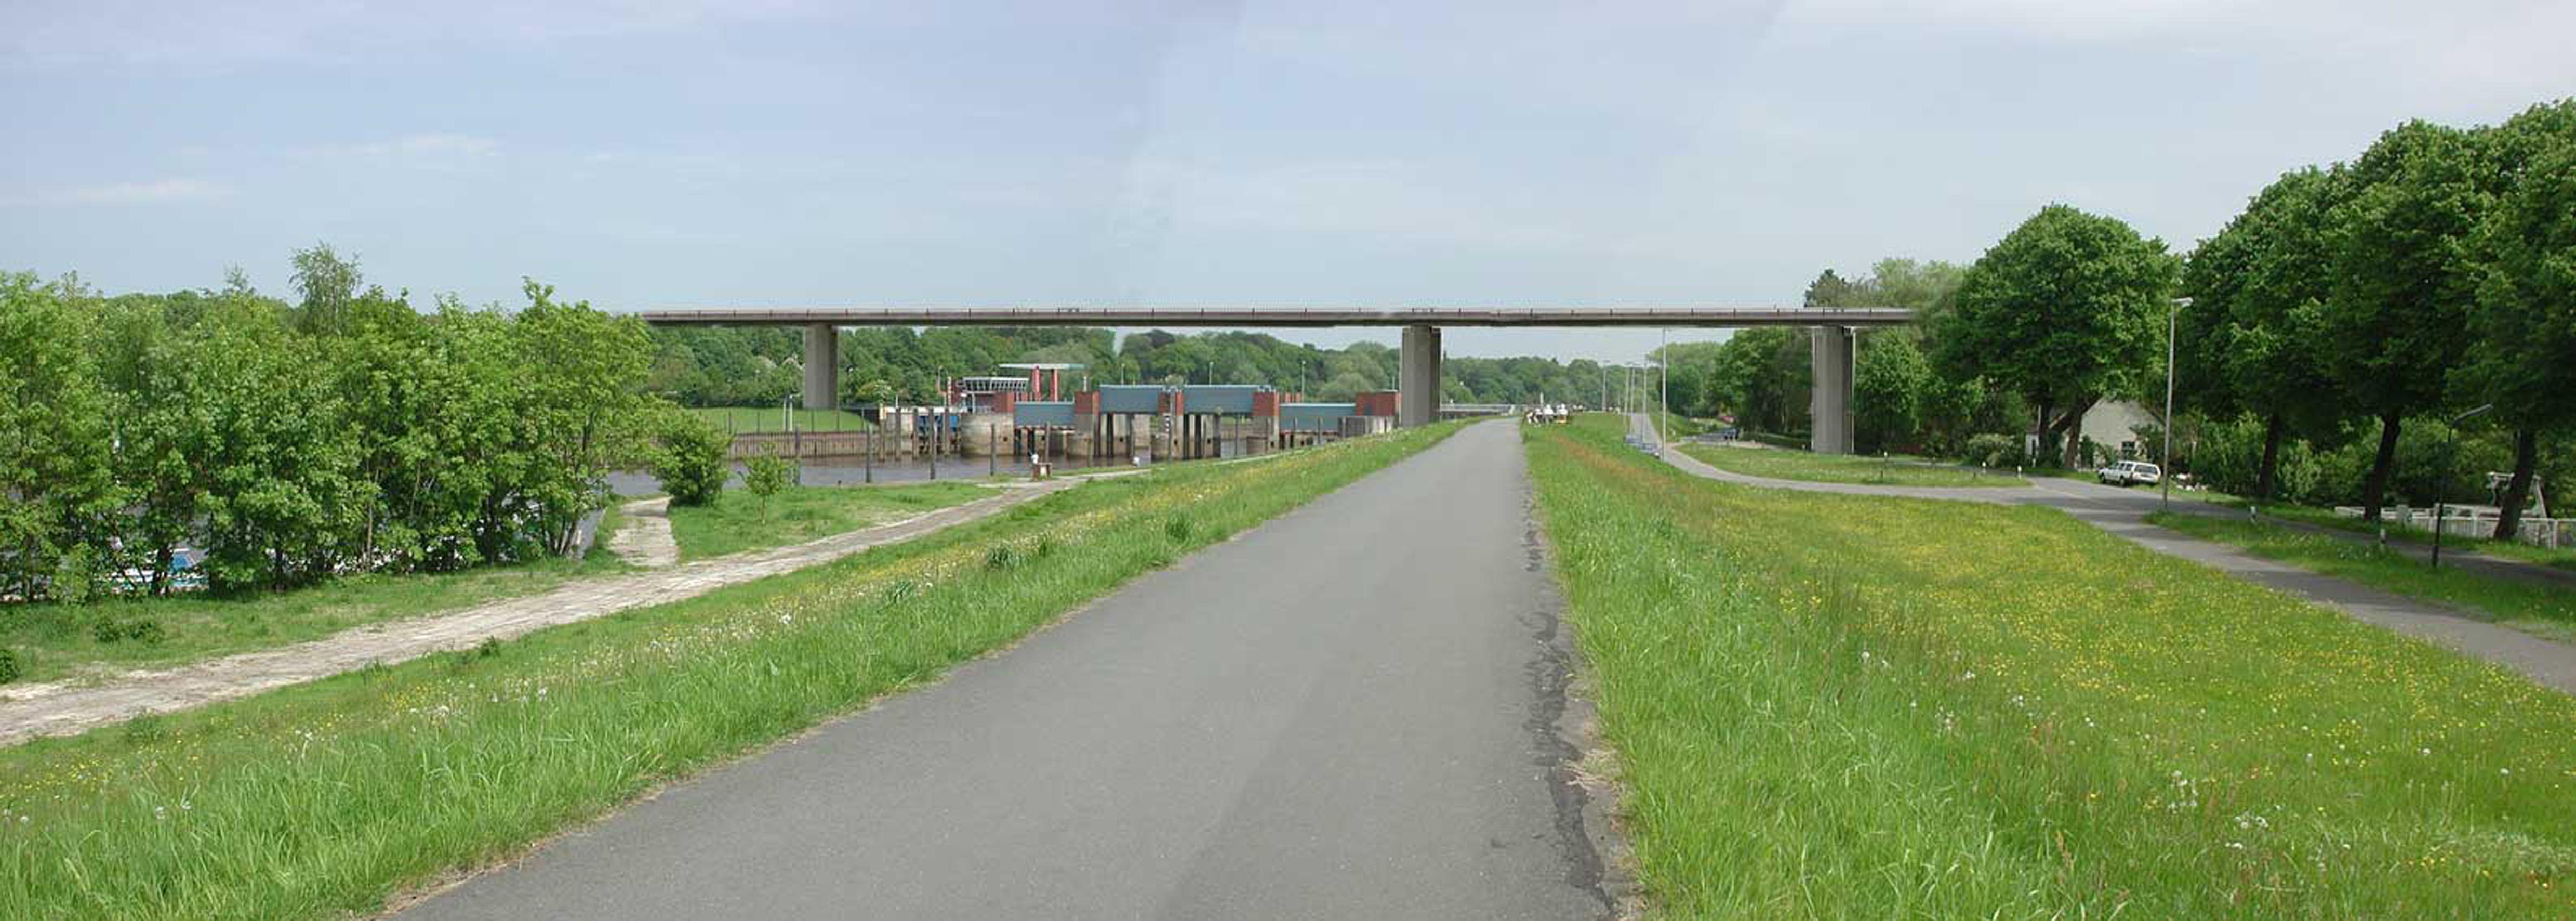 Fotomontage Lesumbrücke